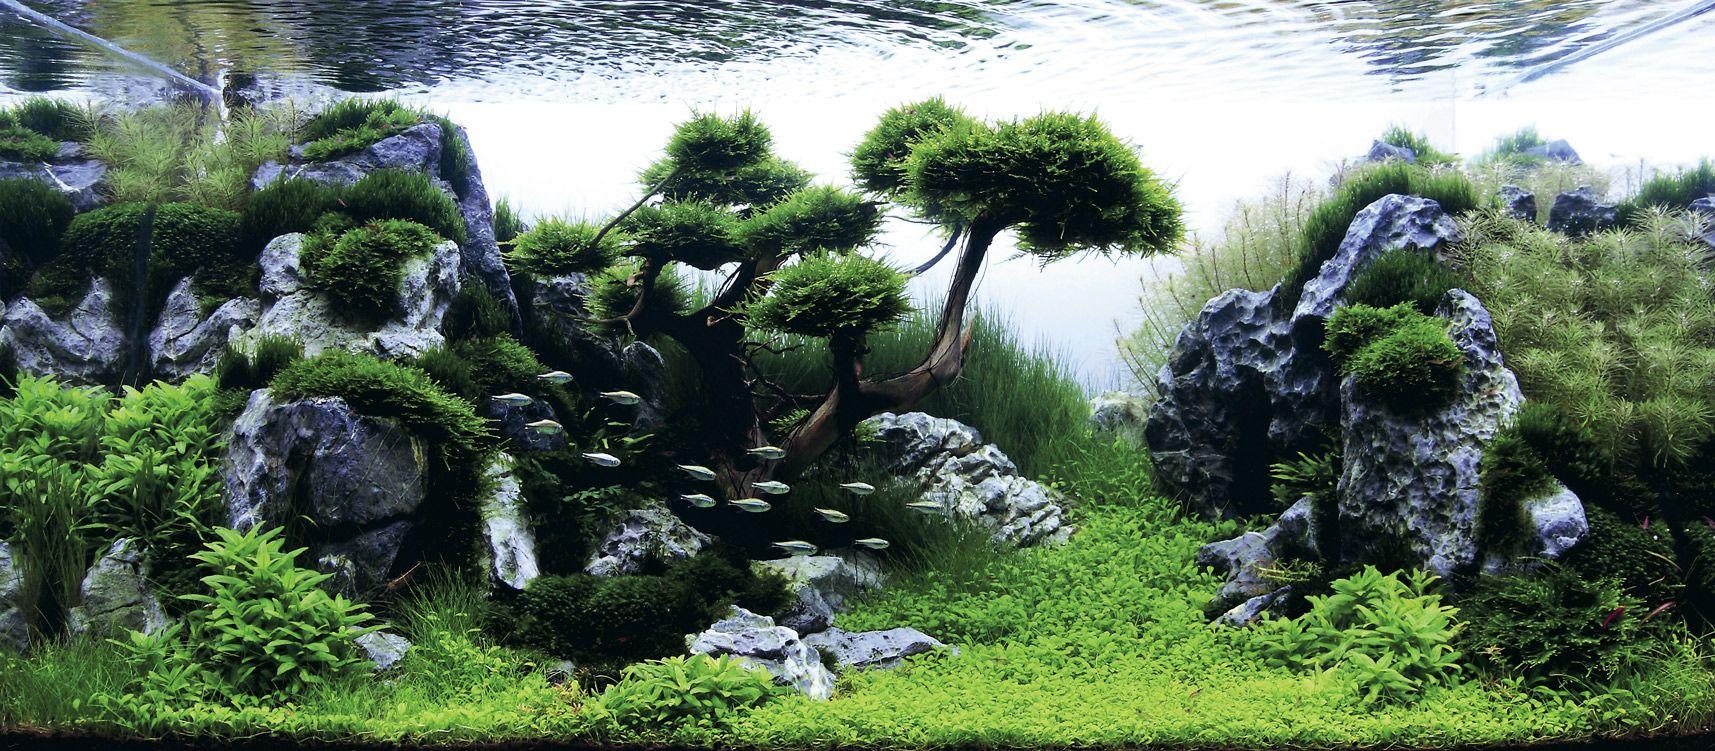 High Quality The Worldu0027s Largest Nature Aquarium And Aquatic Plants Layout Competition.